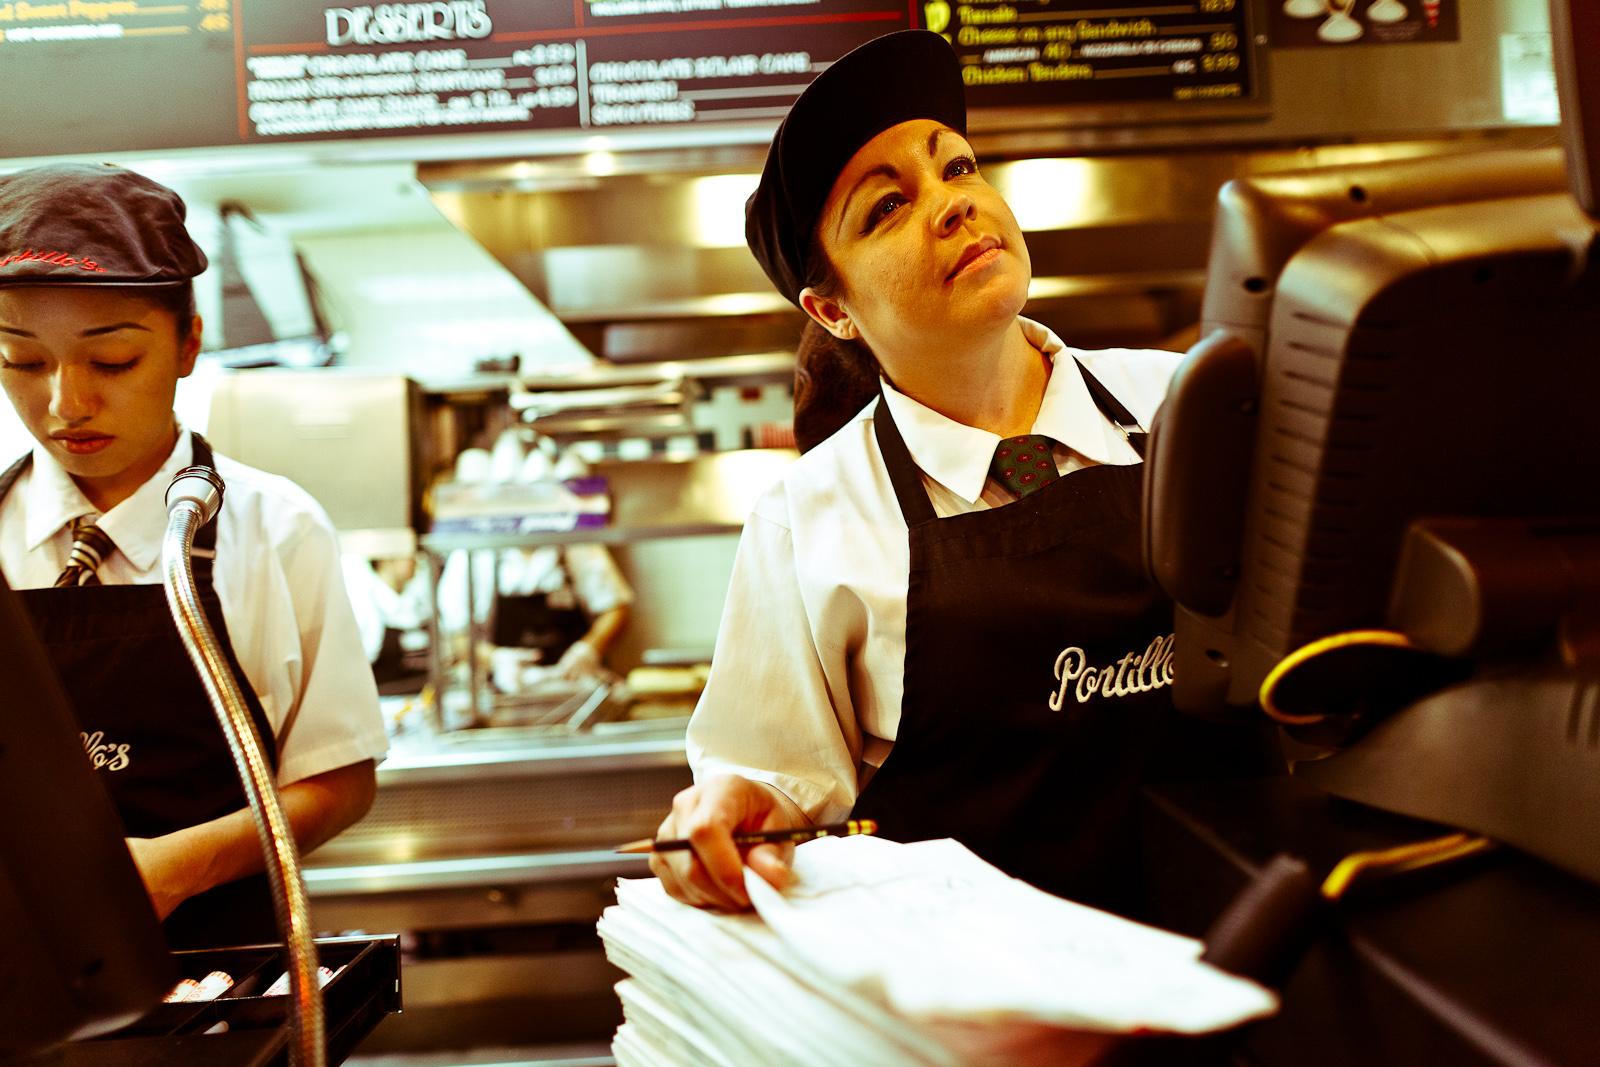 Order time at Portillo's